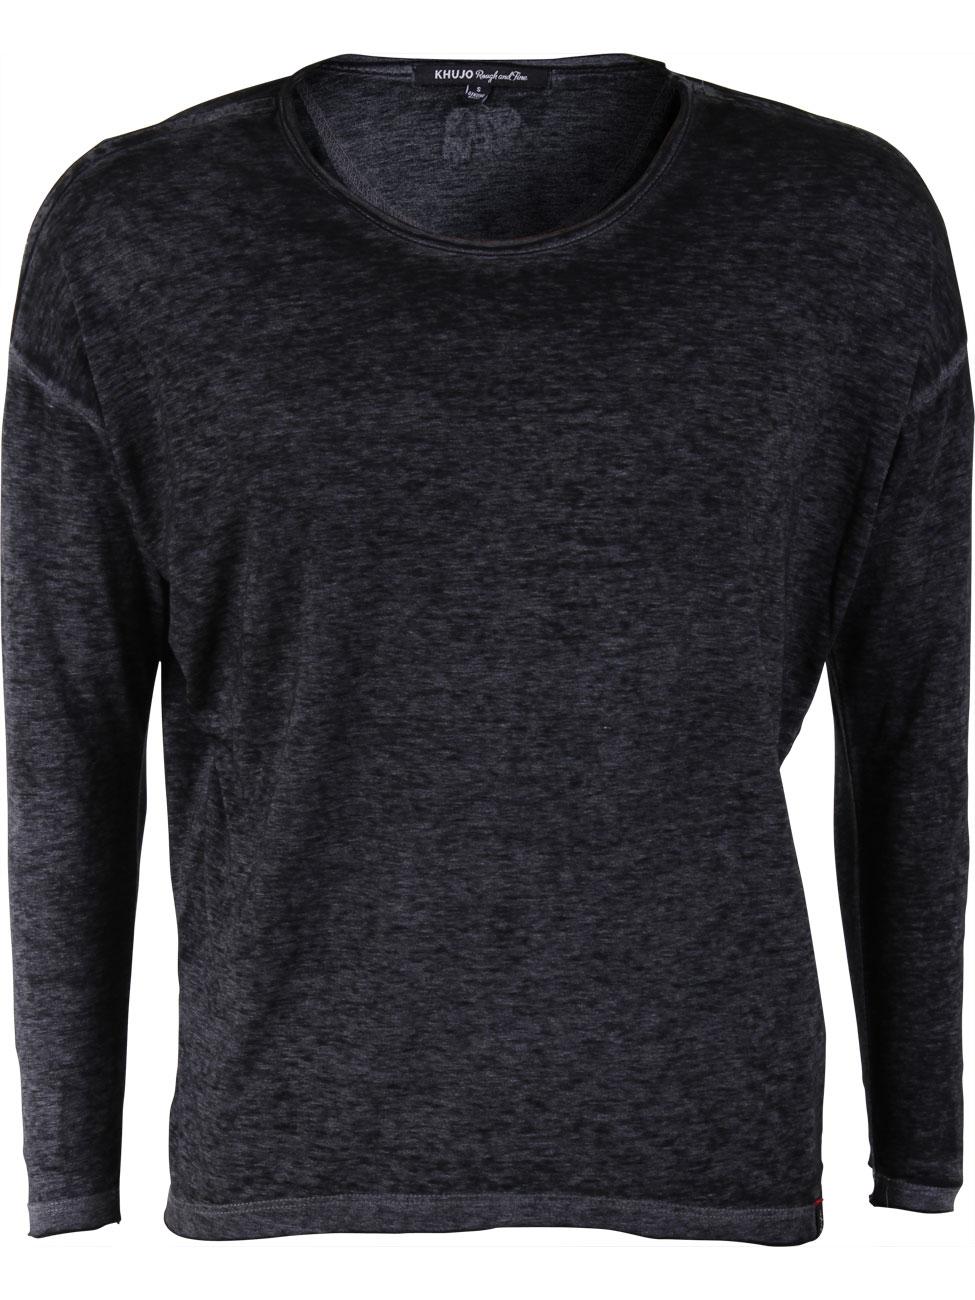 khujo damen langarm shirt ariana kaufen jeans direct de. Black Bedroom Furniture Sets. Home Design Ideas